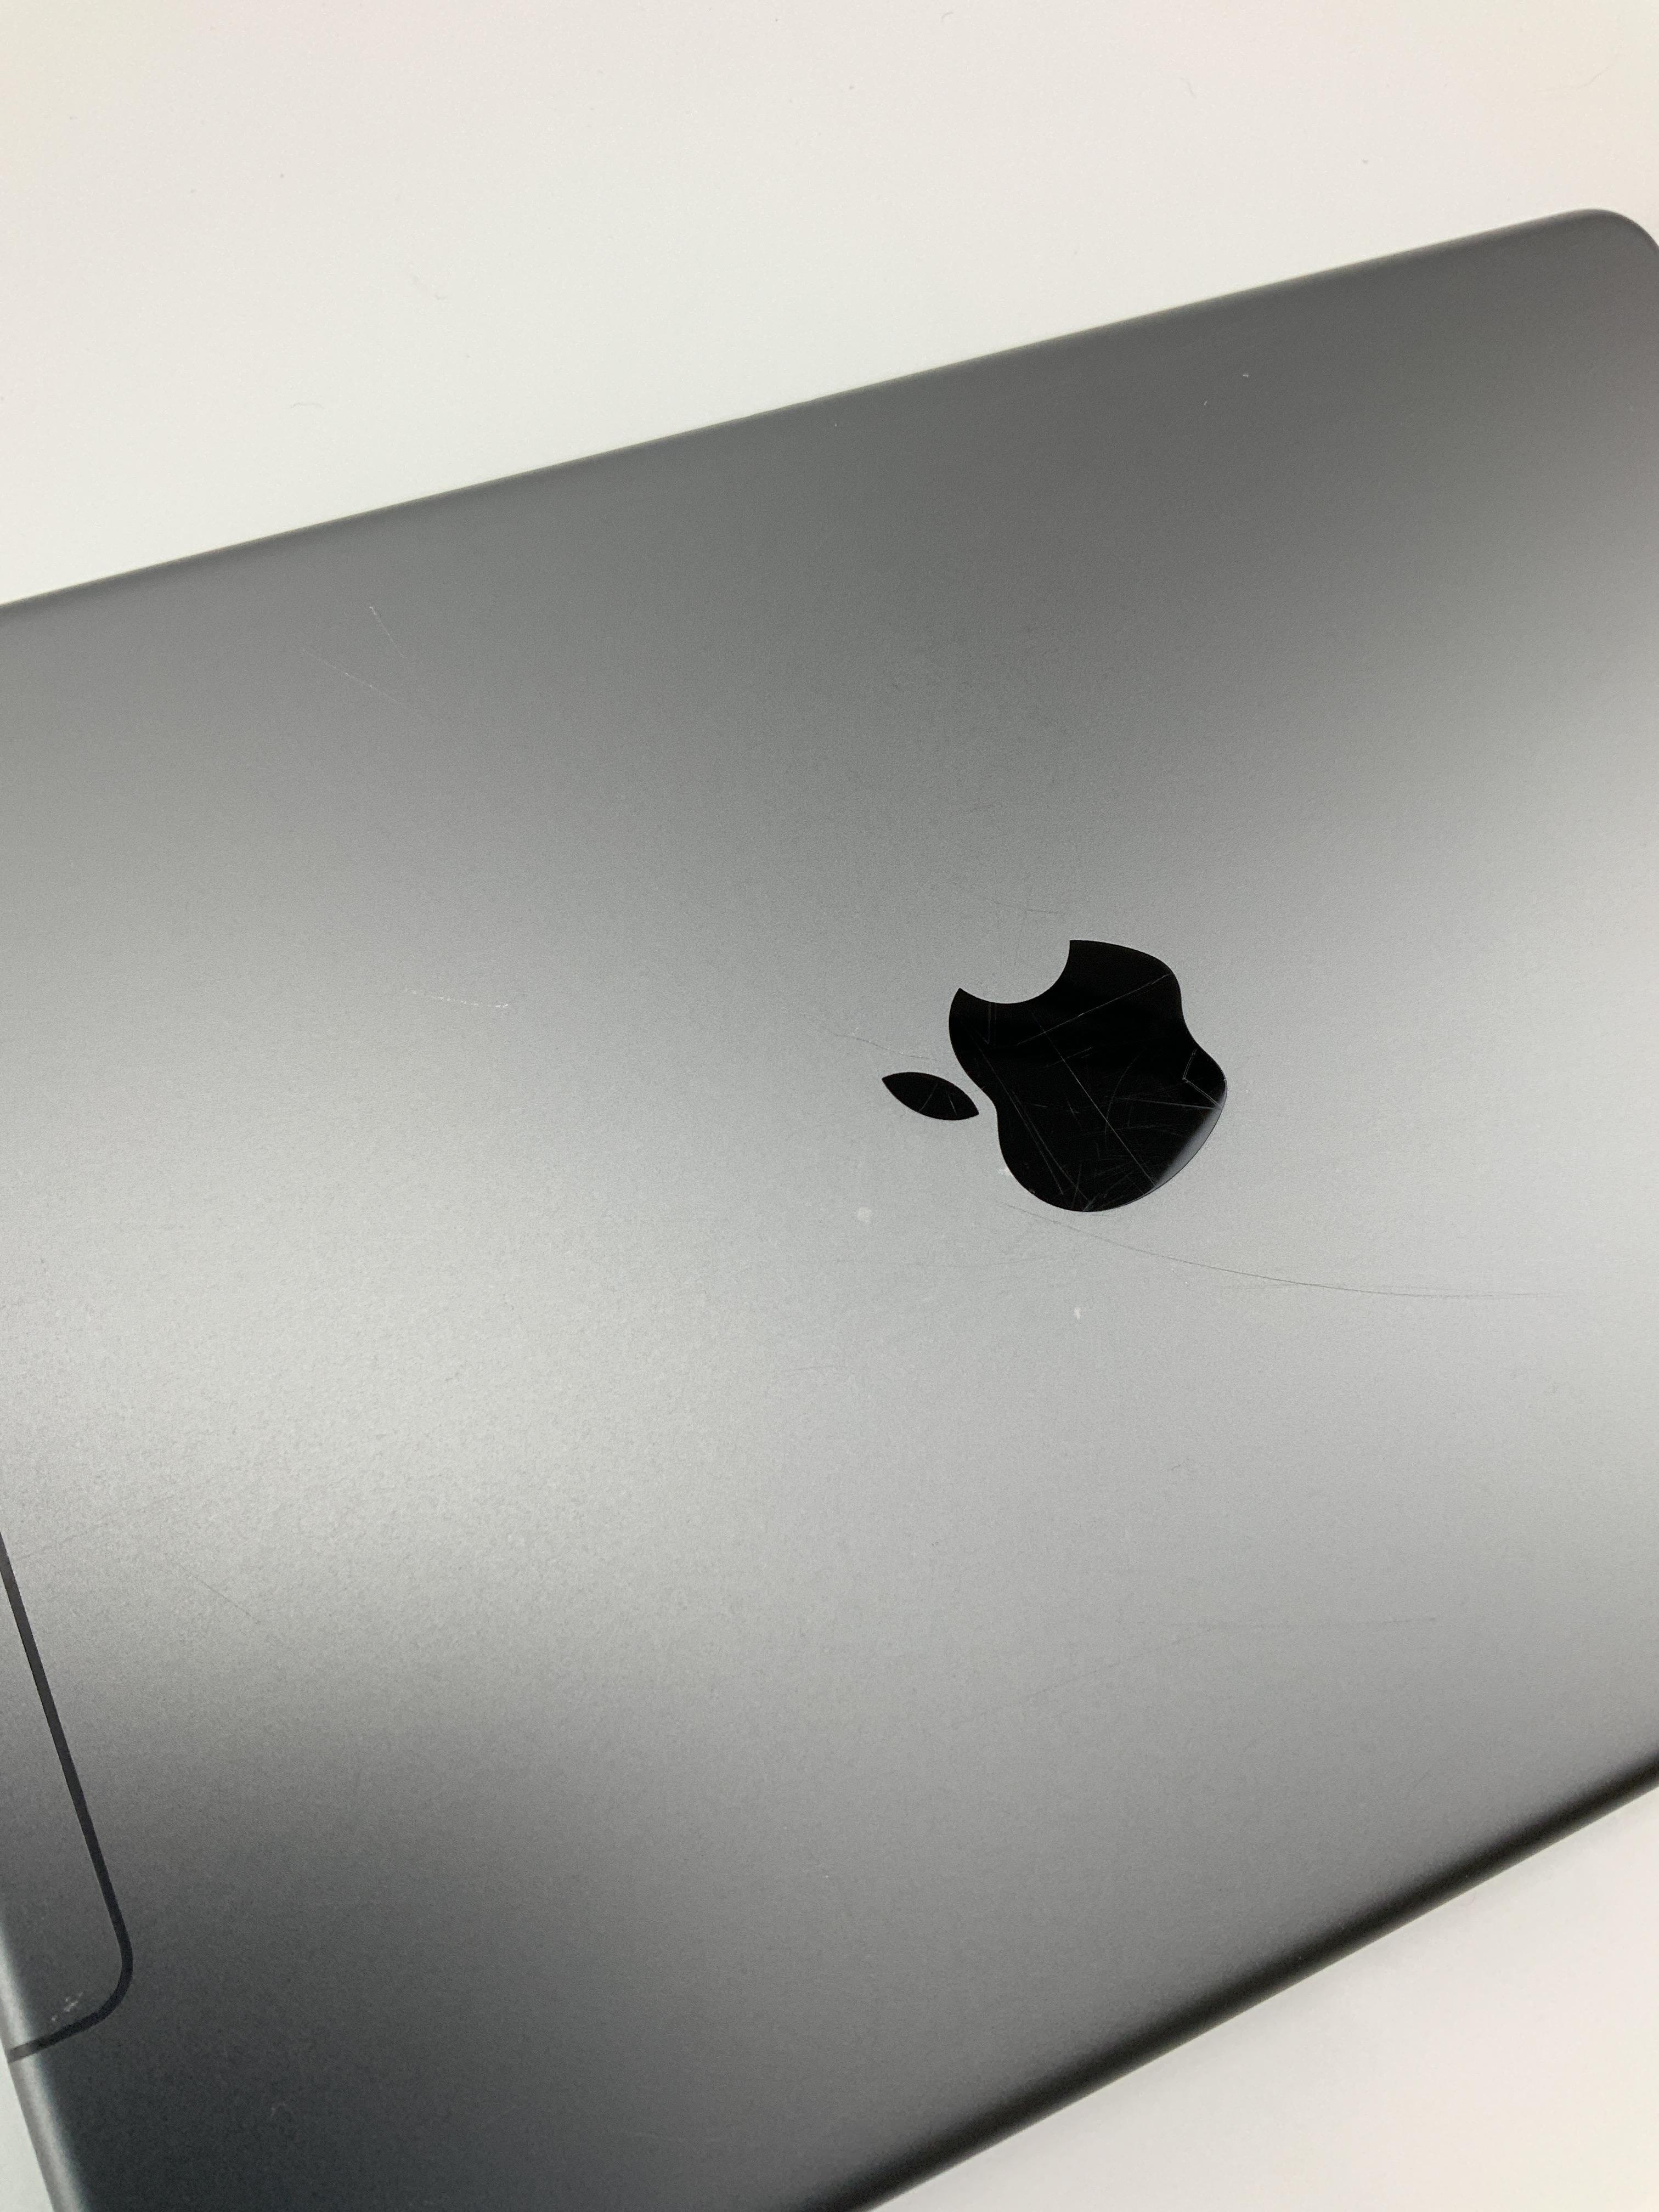 iPad Air 3 Wi-Fi + Cellular 256GB, 256GB, Space Gray, bild 4